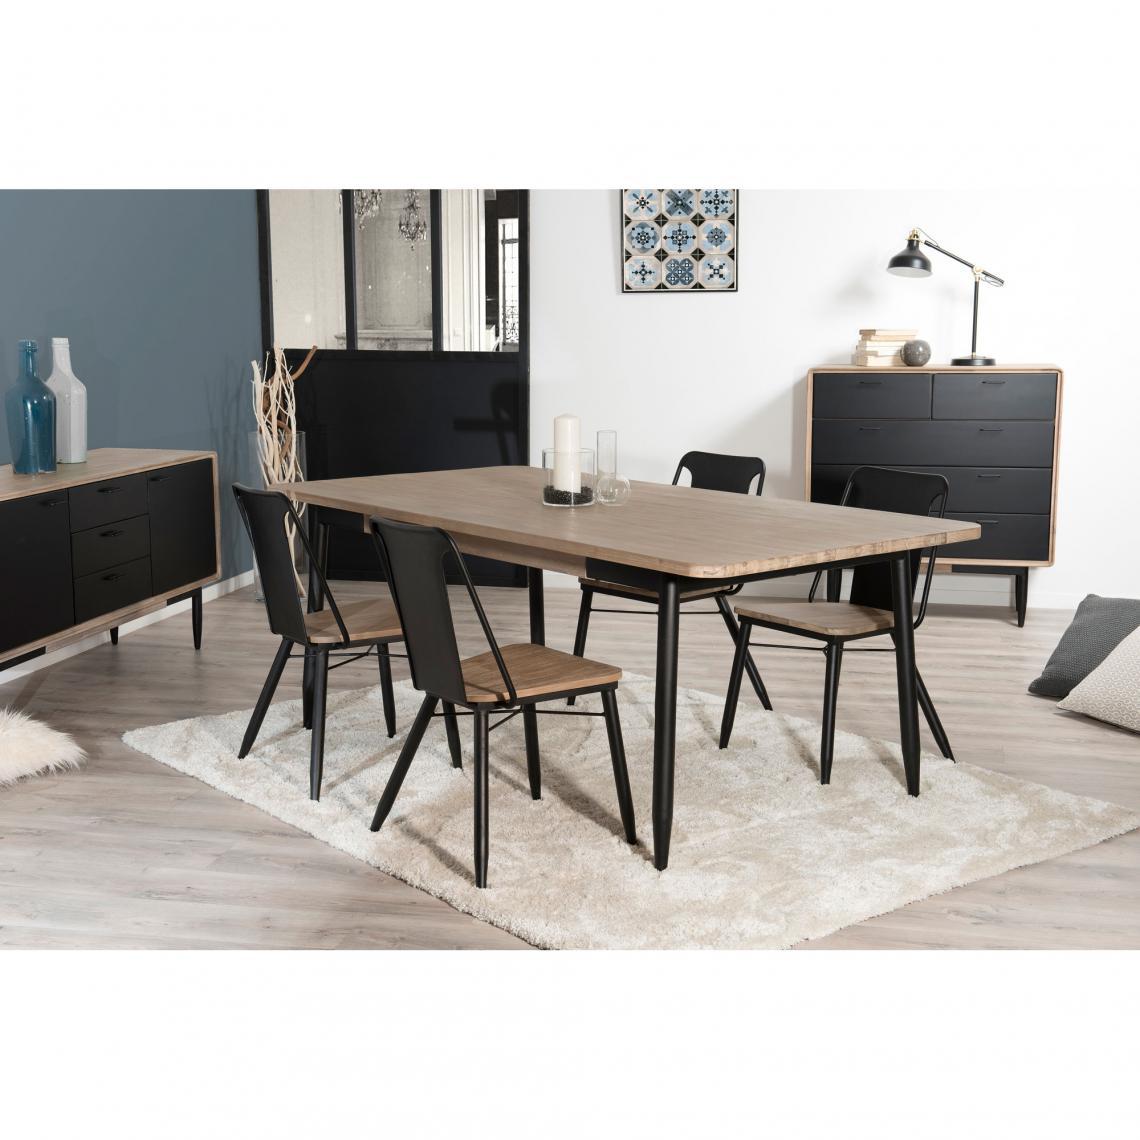 table manger rectangulaire 200 x 100 cm esprit atelier chene clair ceruse